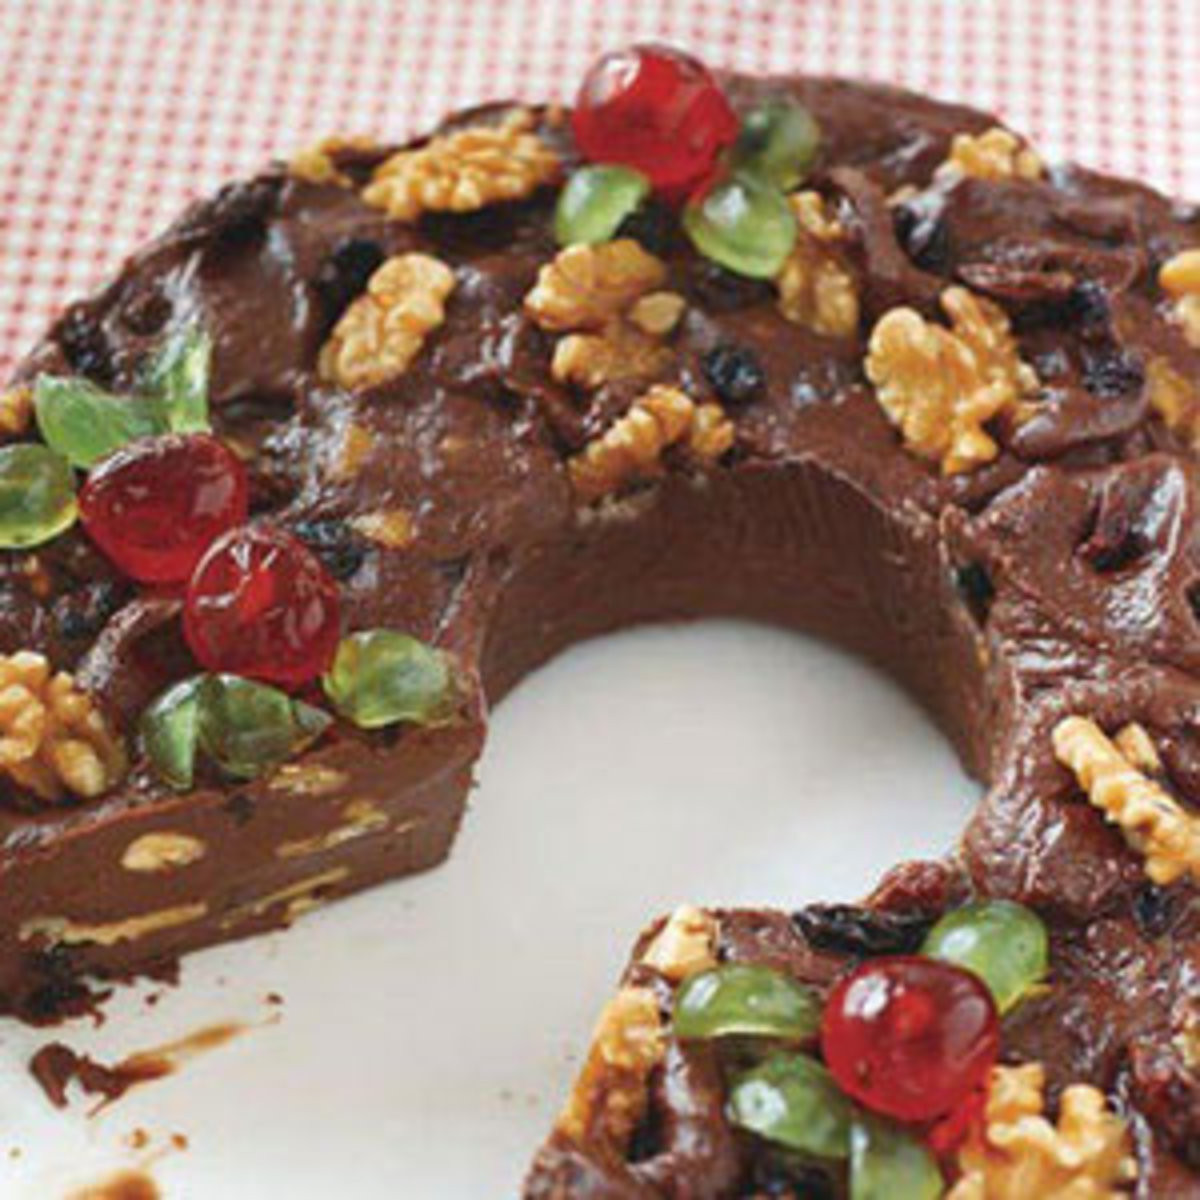 Rachael Ray Christmas Fudge Wreath  Christmas Dessert Recipes Rachael Ray Every Day